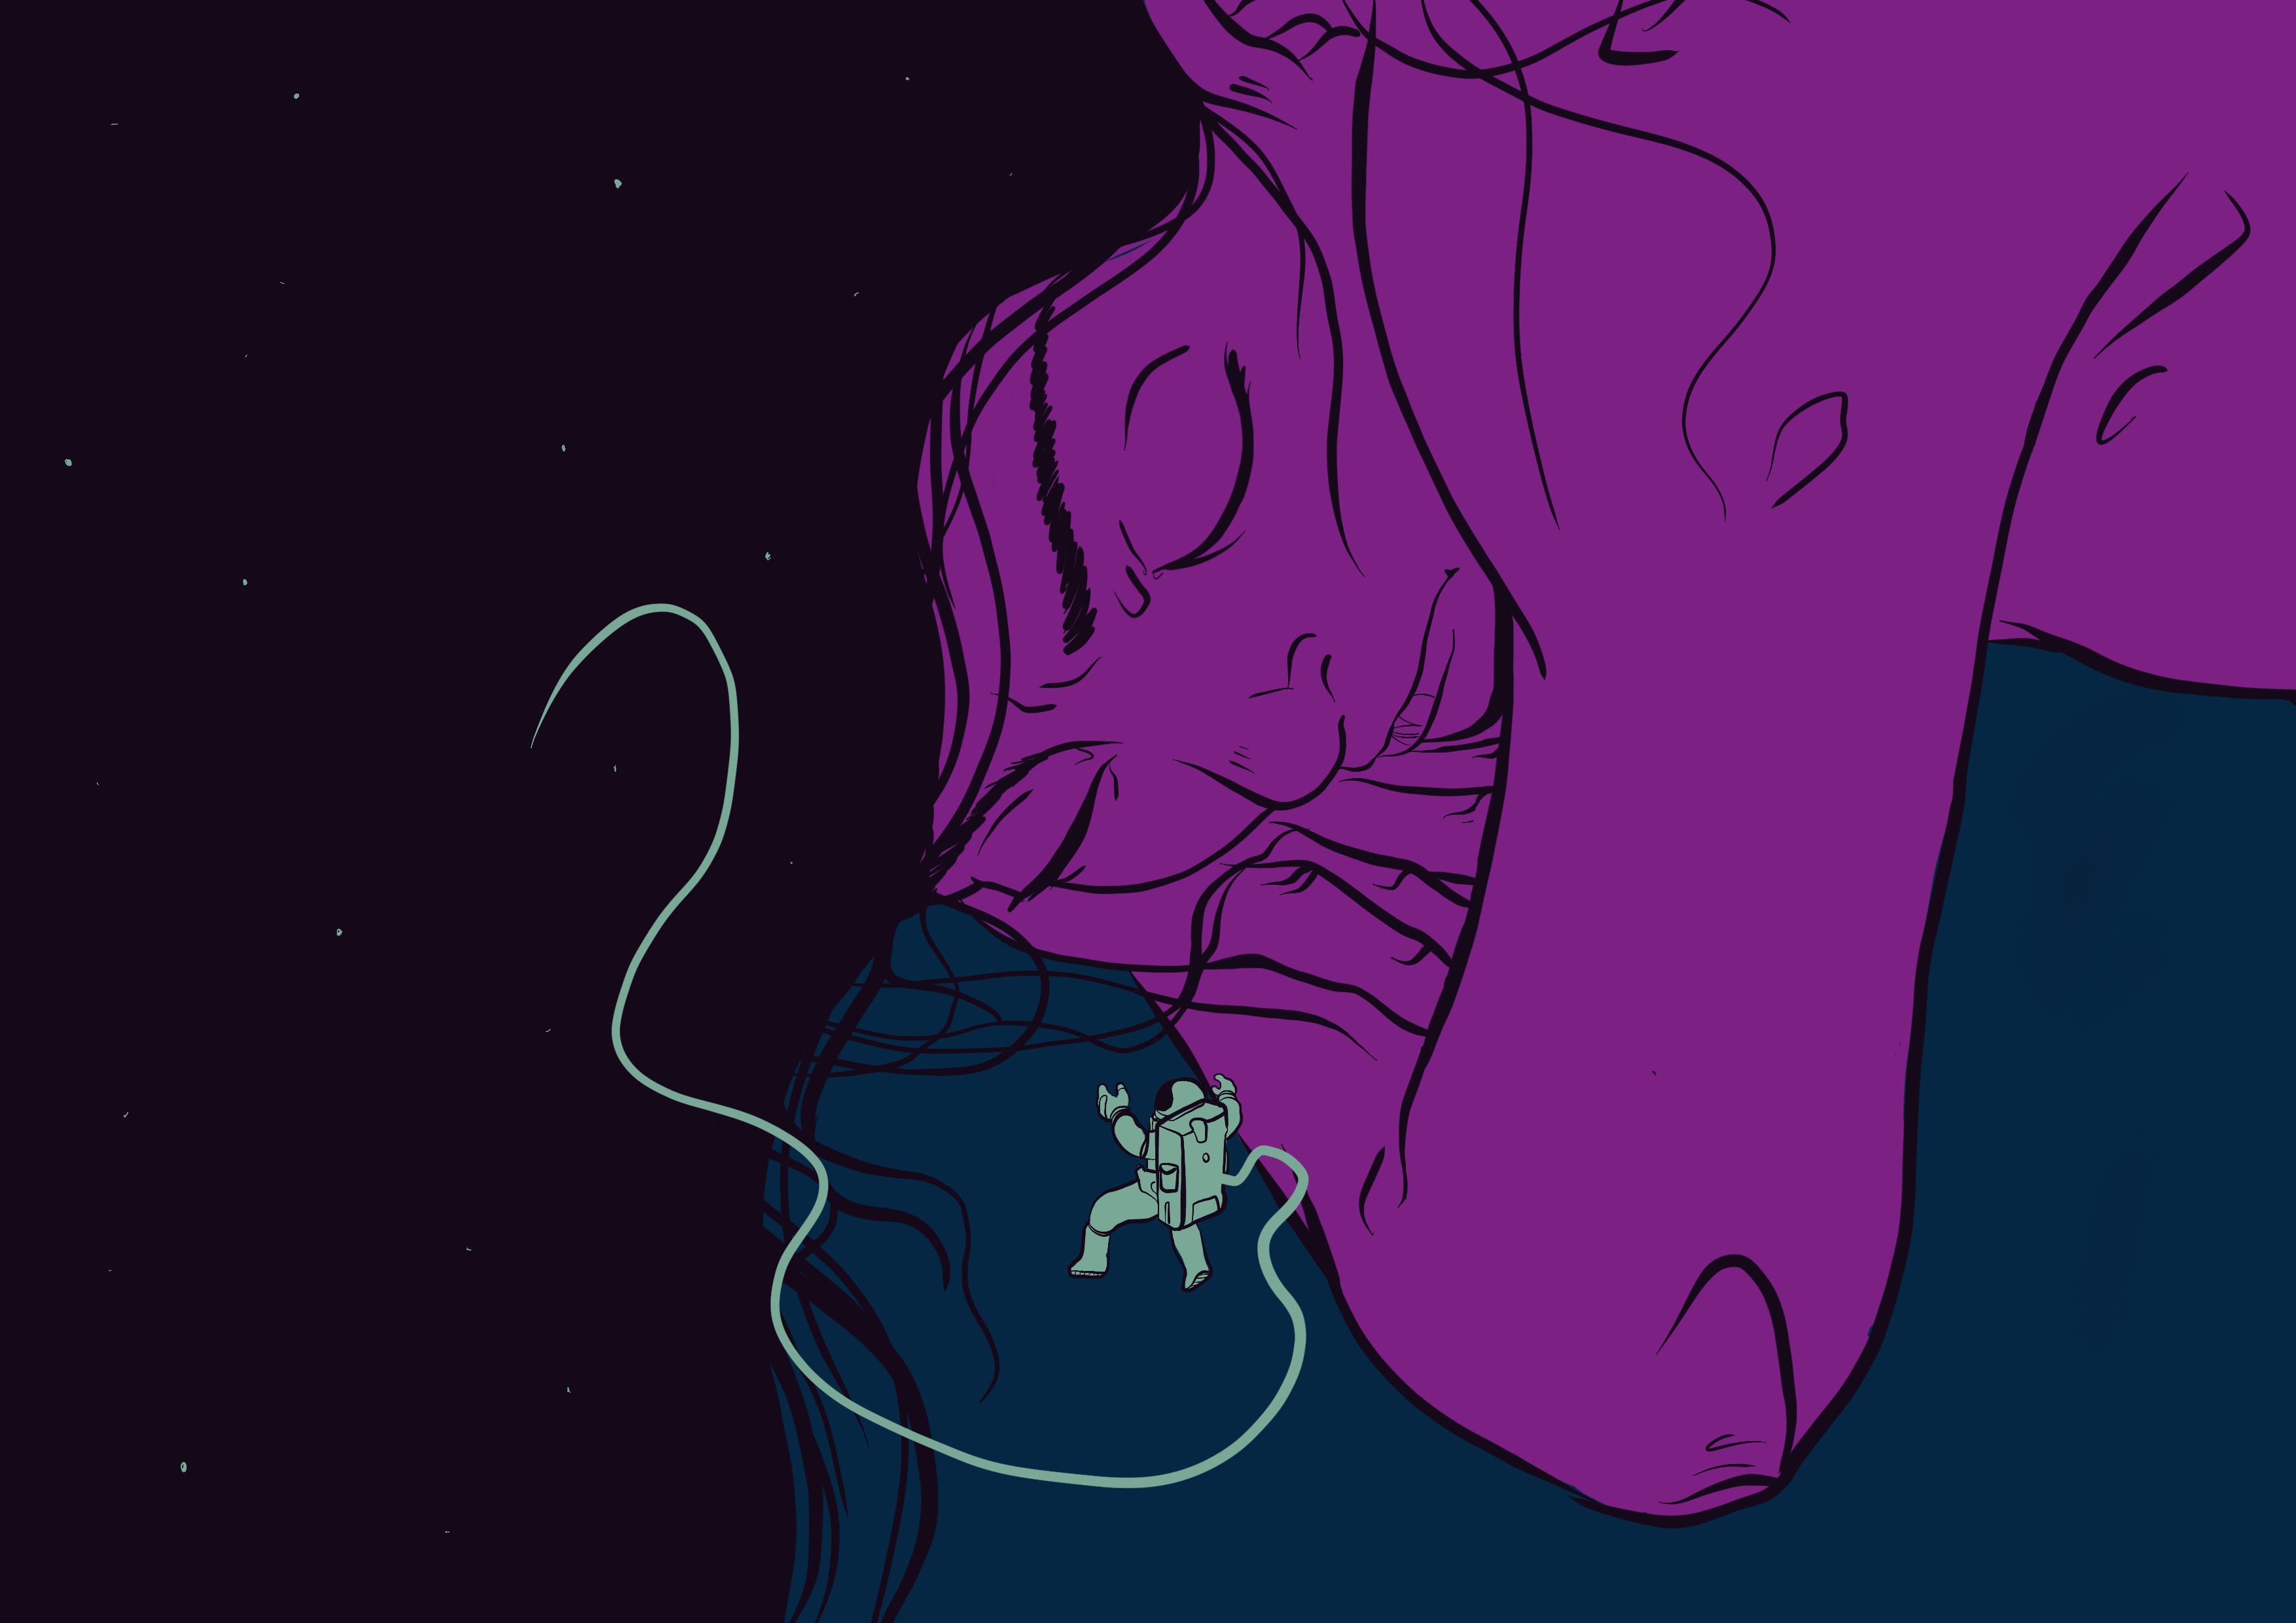 Dream woman space